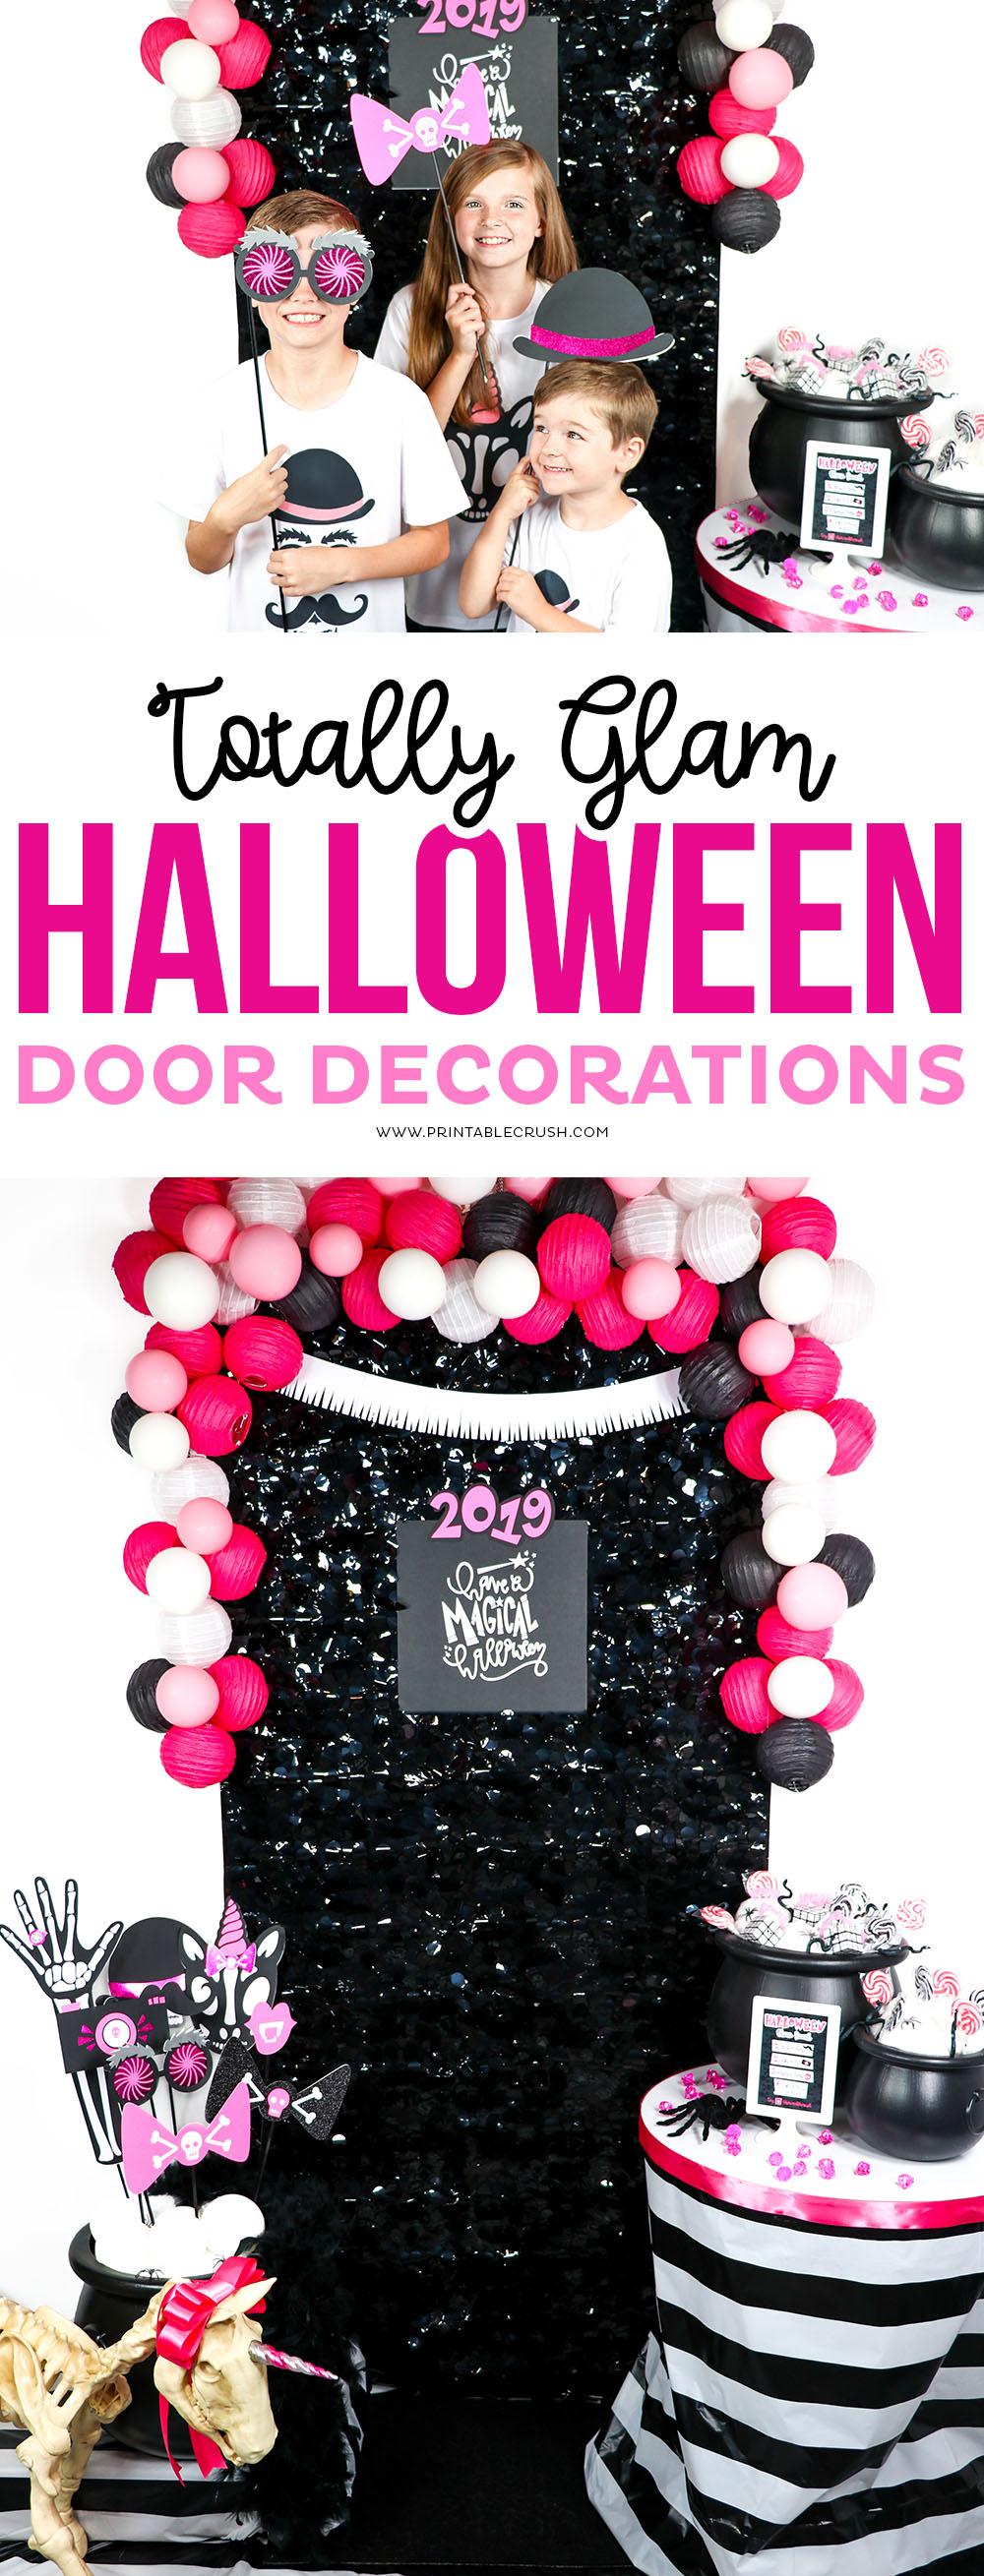 Pink Black and White Halloween Door Decorations